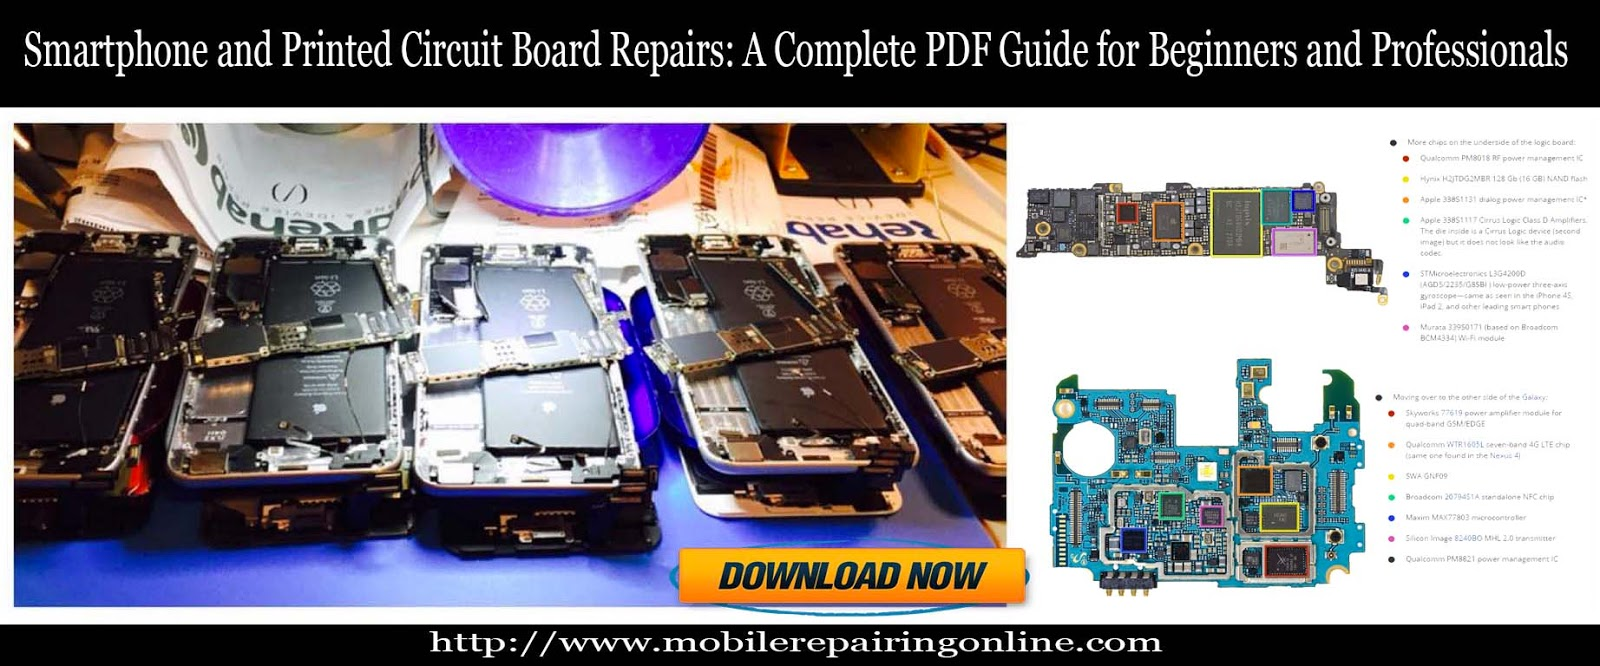 Pdf For Smartphones